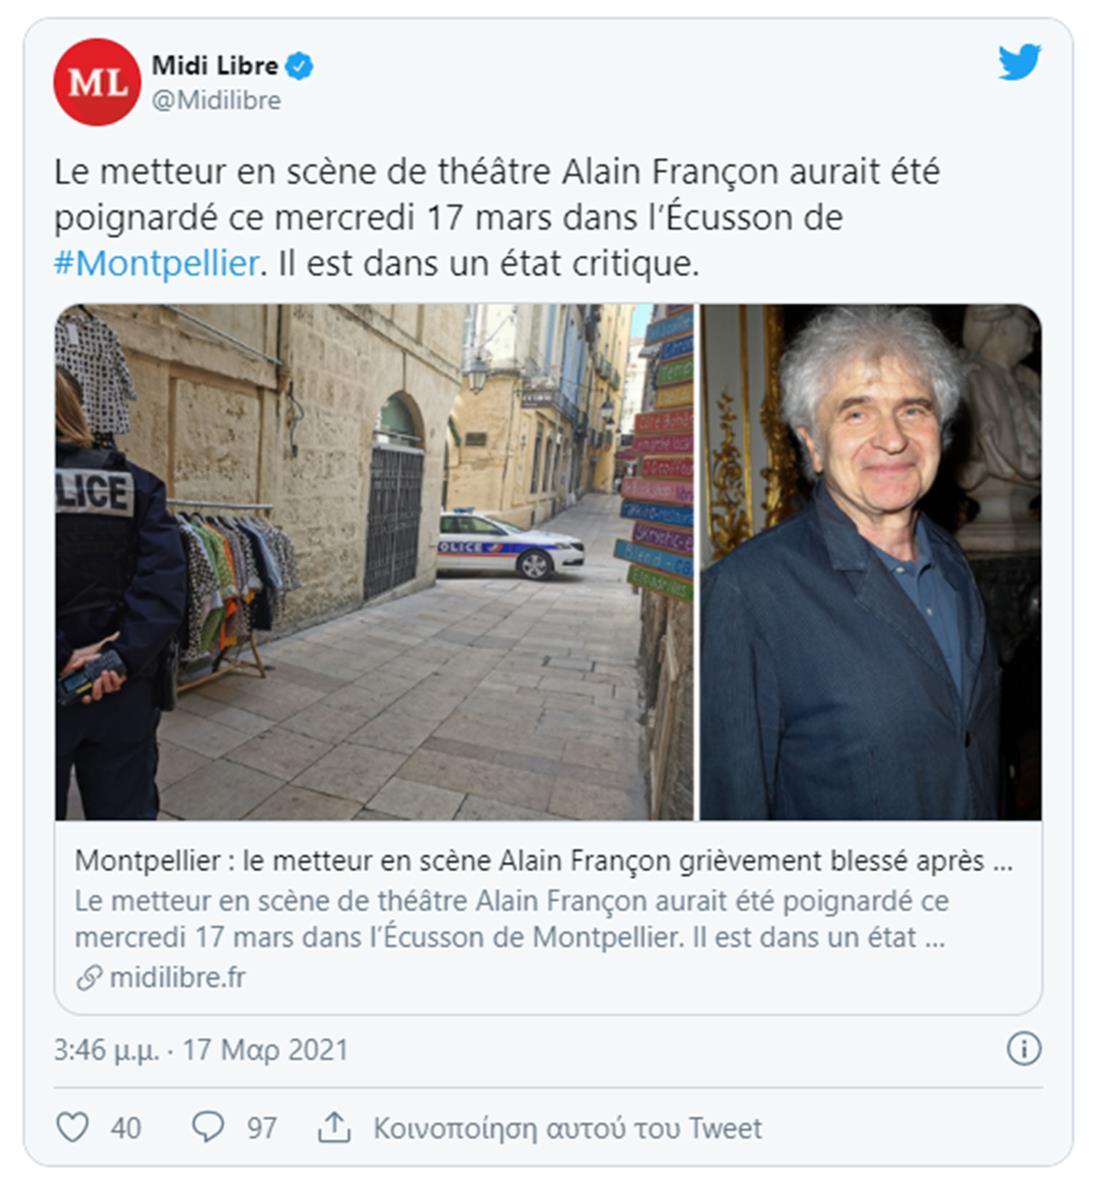 Alain Francon - επίθεση με μαχαίρι